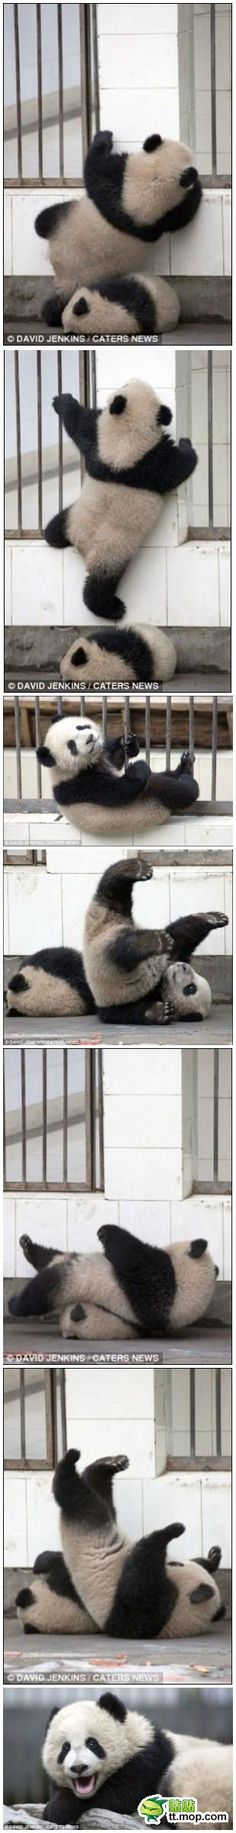 Great Escape by Panda